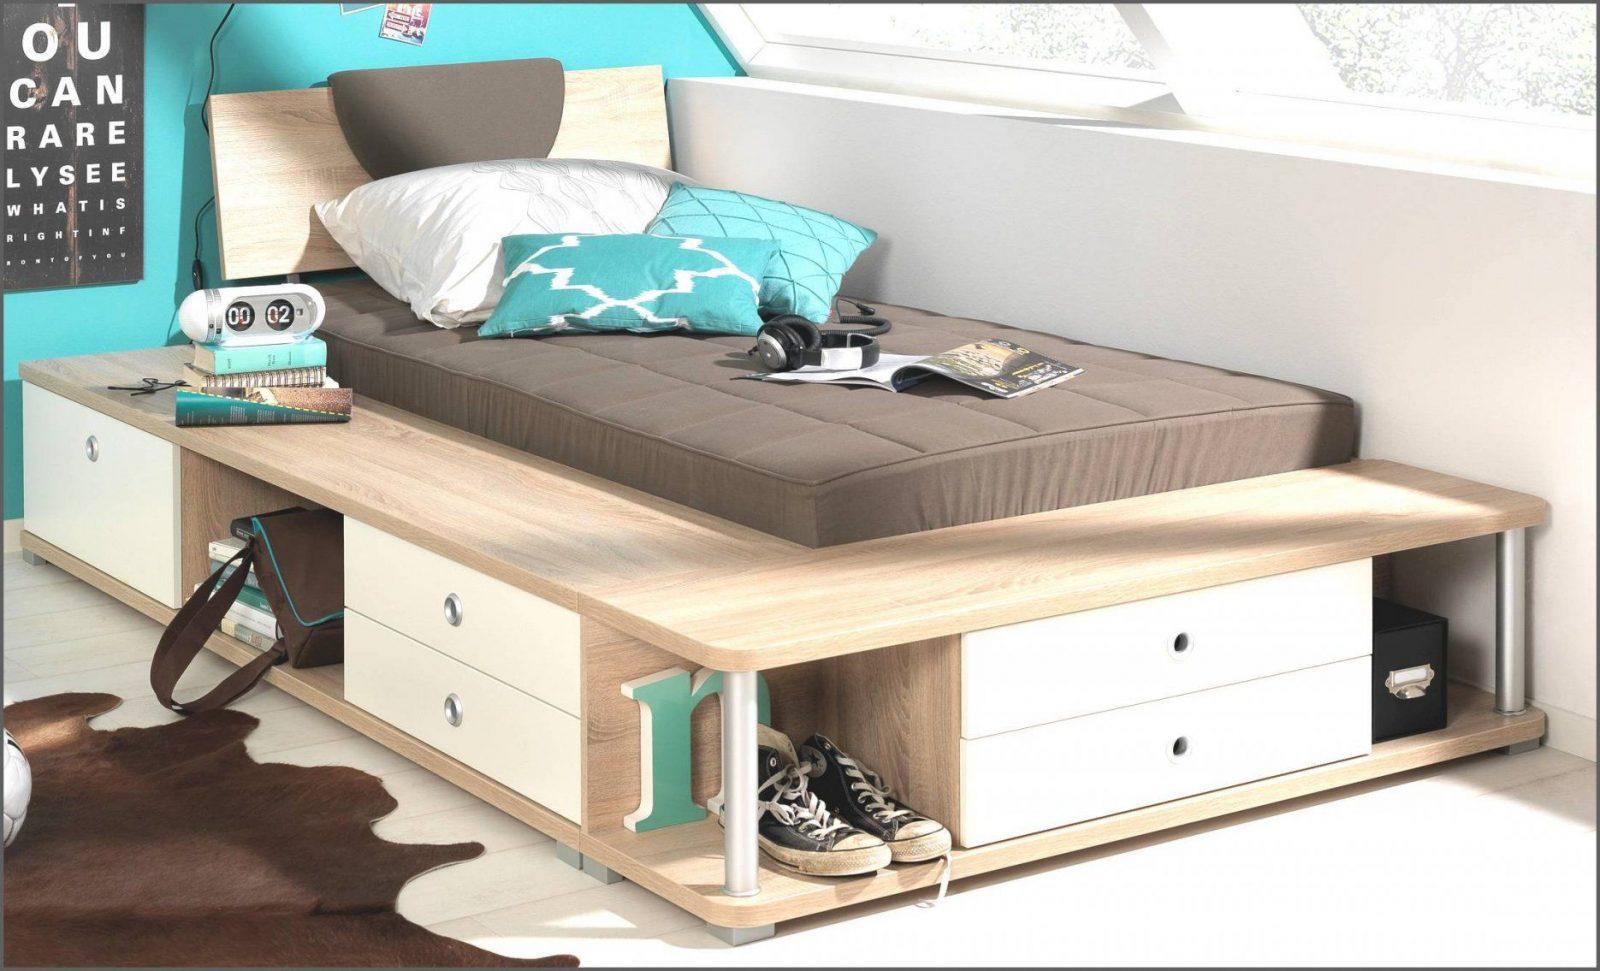 Spannende Ikea Bett Selber Bauen Bett Selber Bauen Ikea Hack Diy von Bett Selber Bauen Ikea Photo